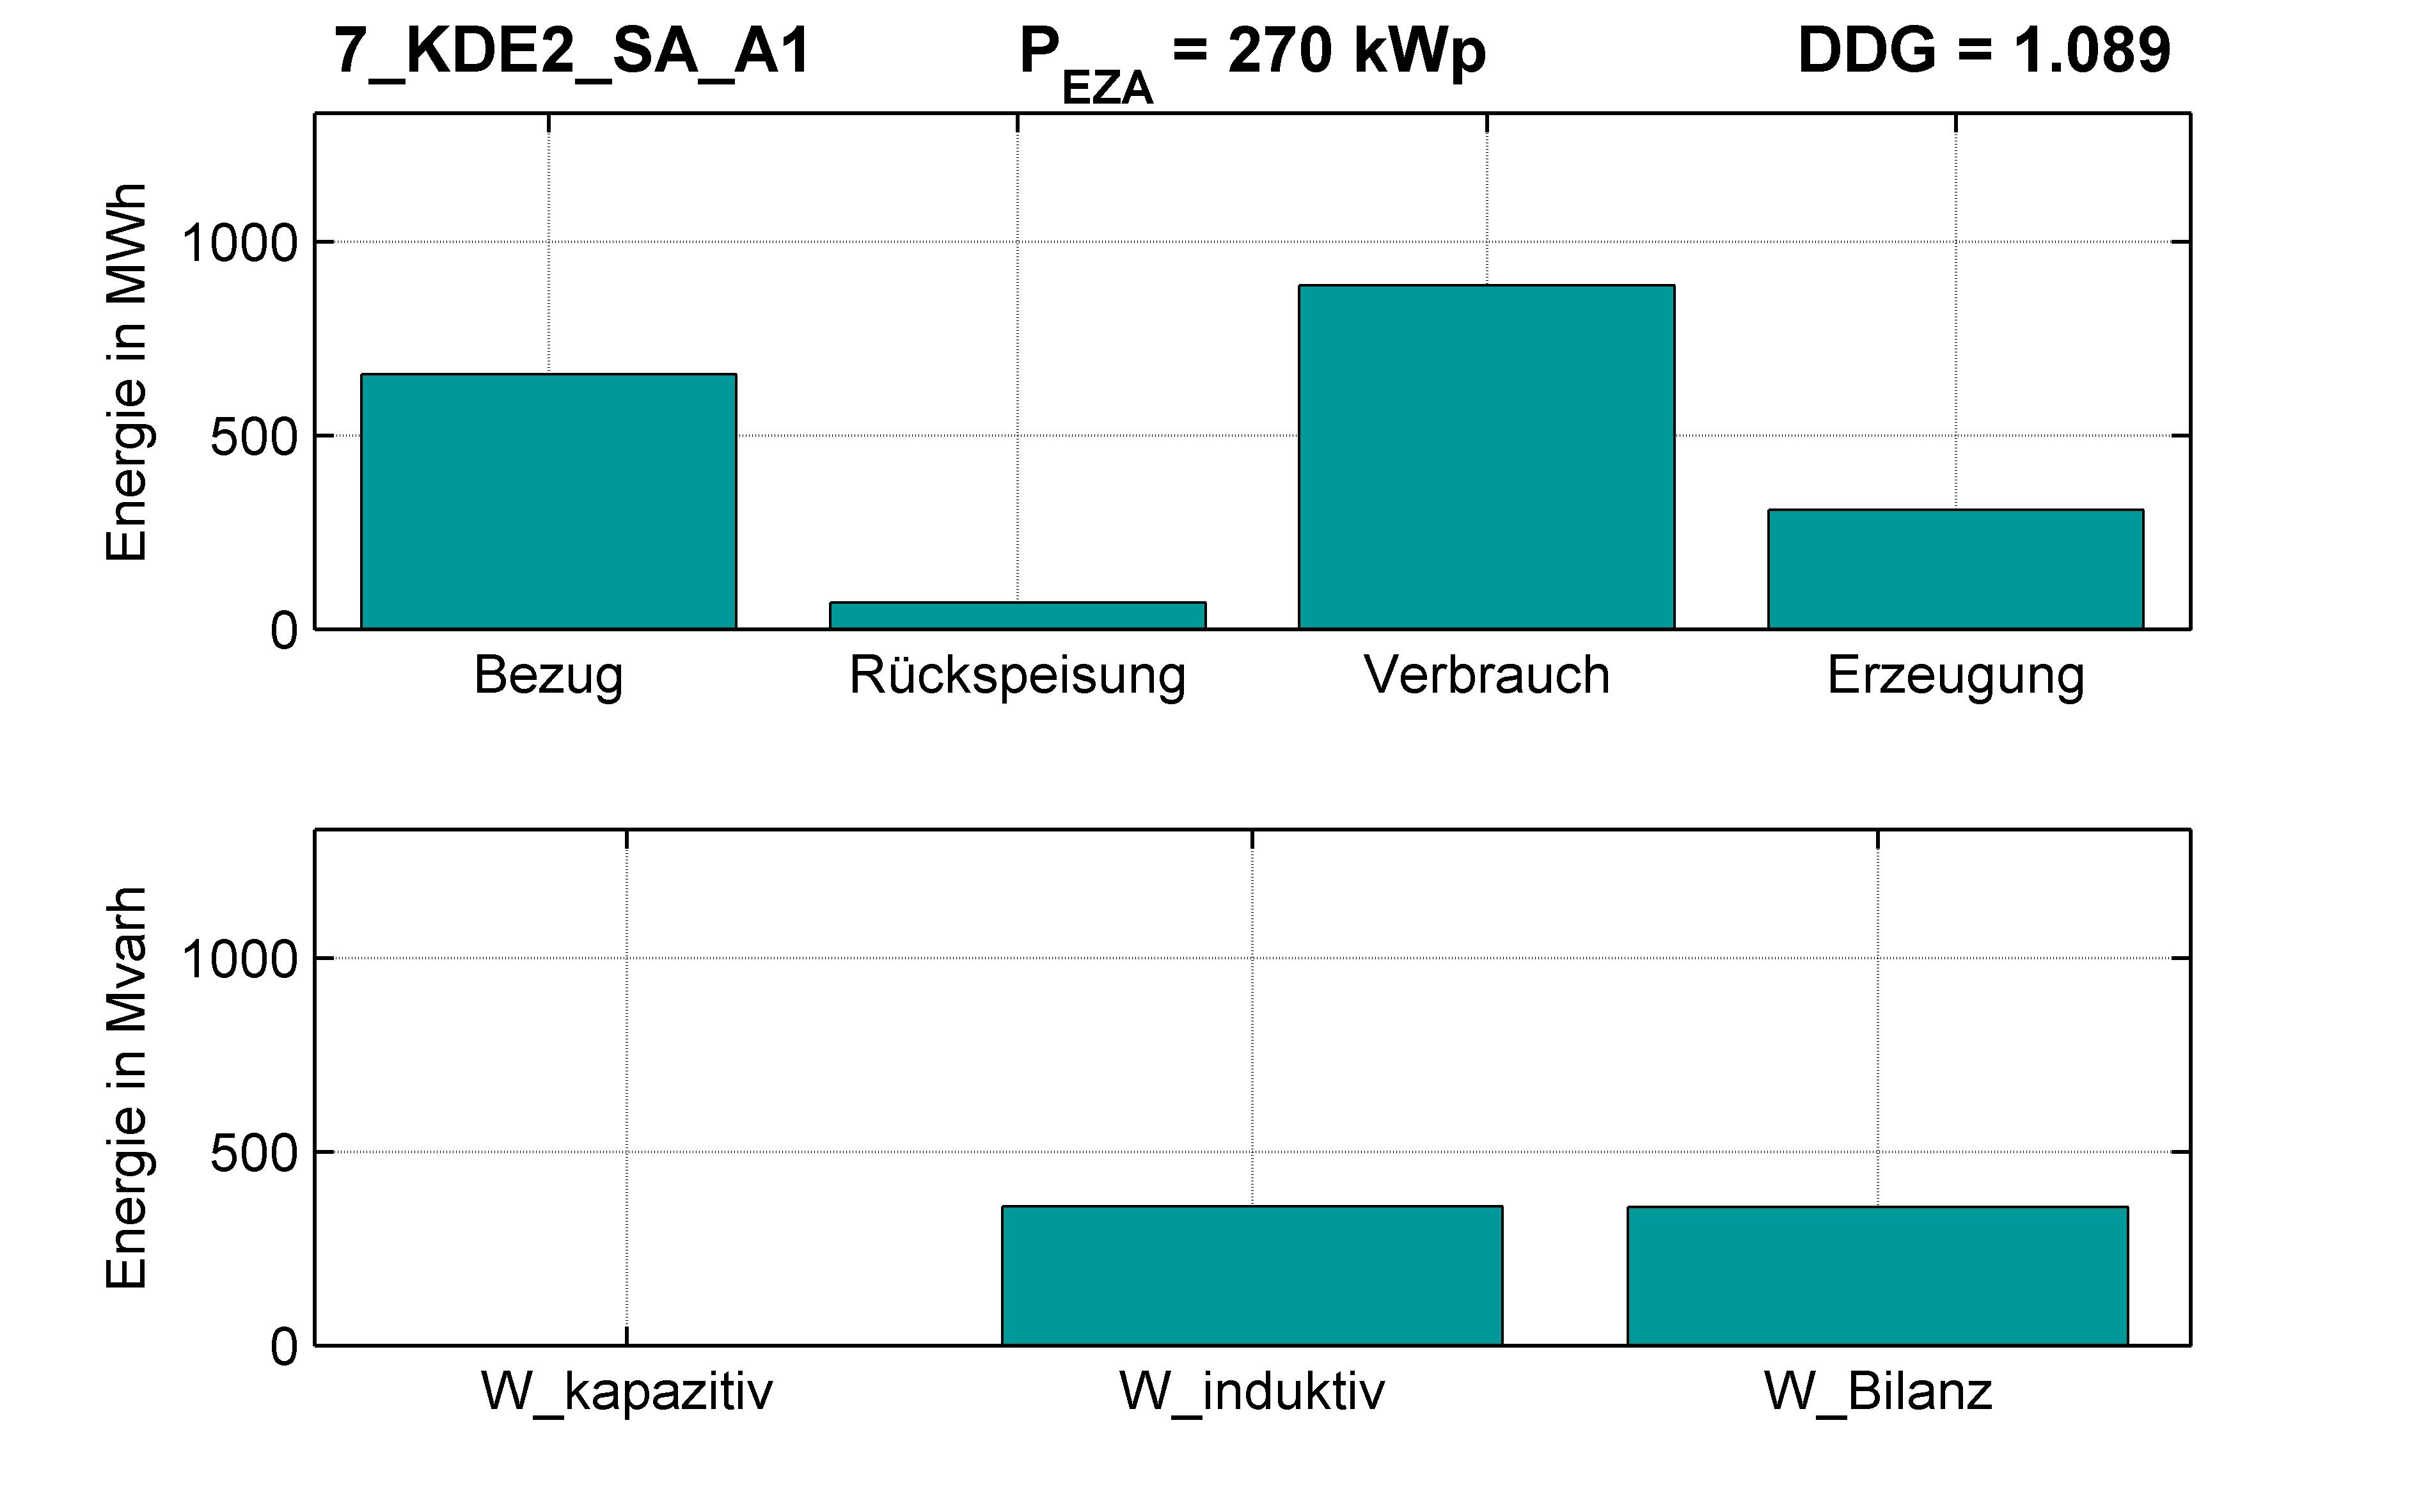 KDE2 | Längsregler (SA) A1 | PQ-Bilanz